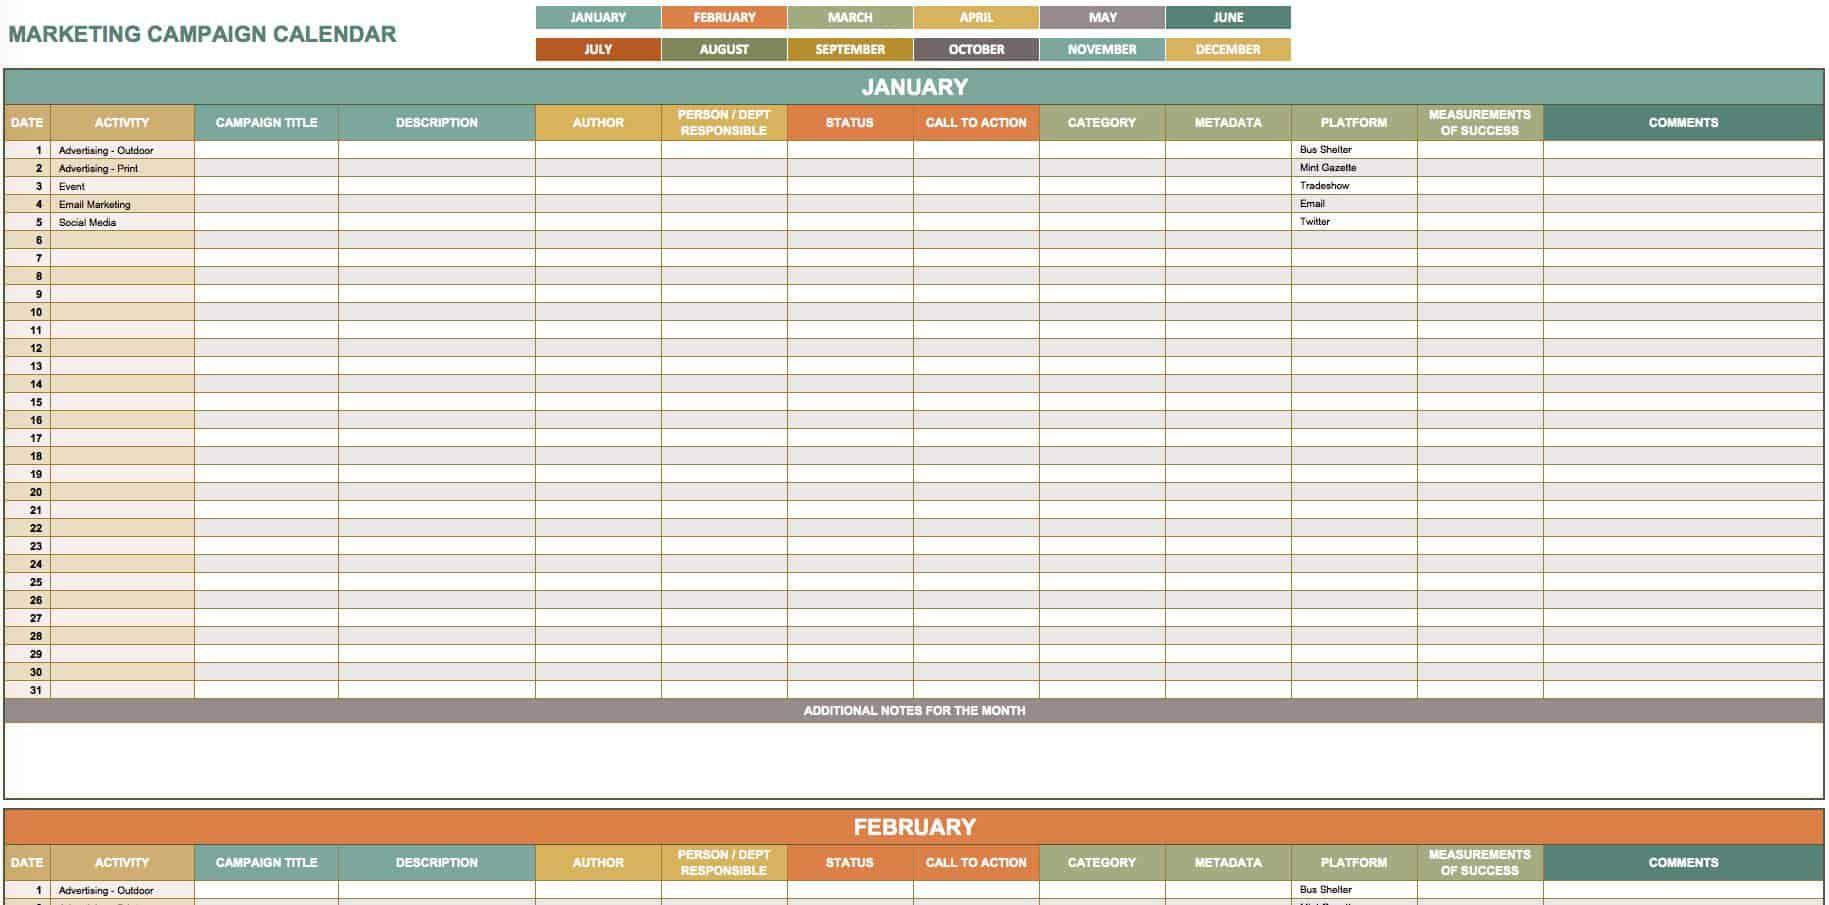 003 Wondrou Political Campaign Plan Template High Definition  Pdf Outline WordFull